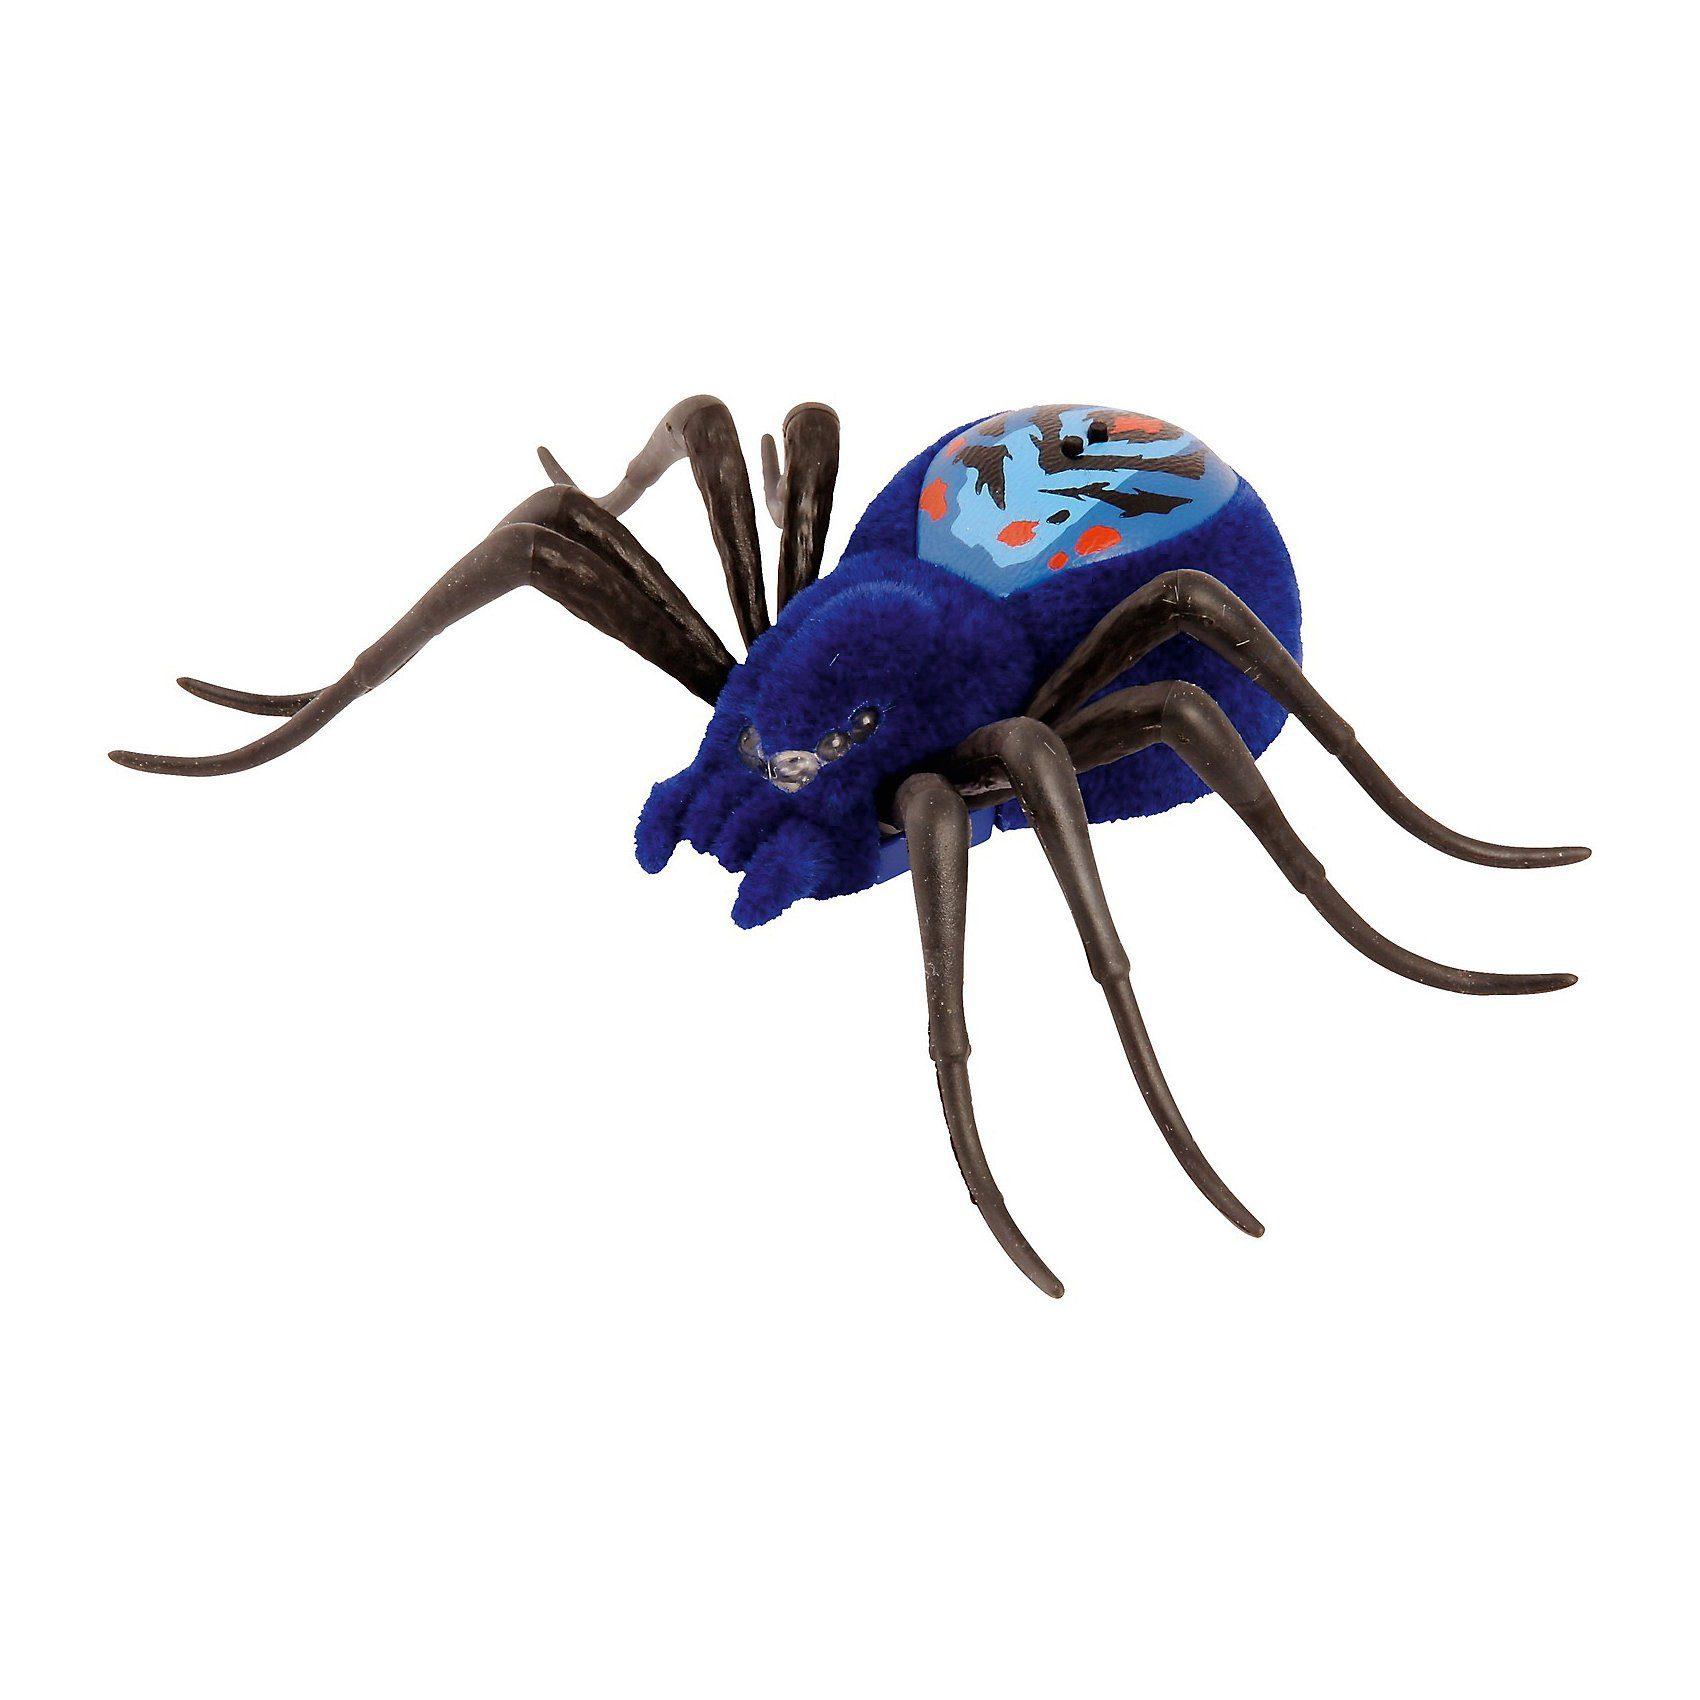 BOTI WILD PETS S1 Spinne blau